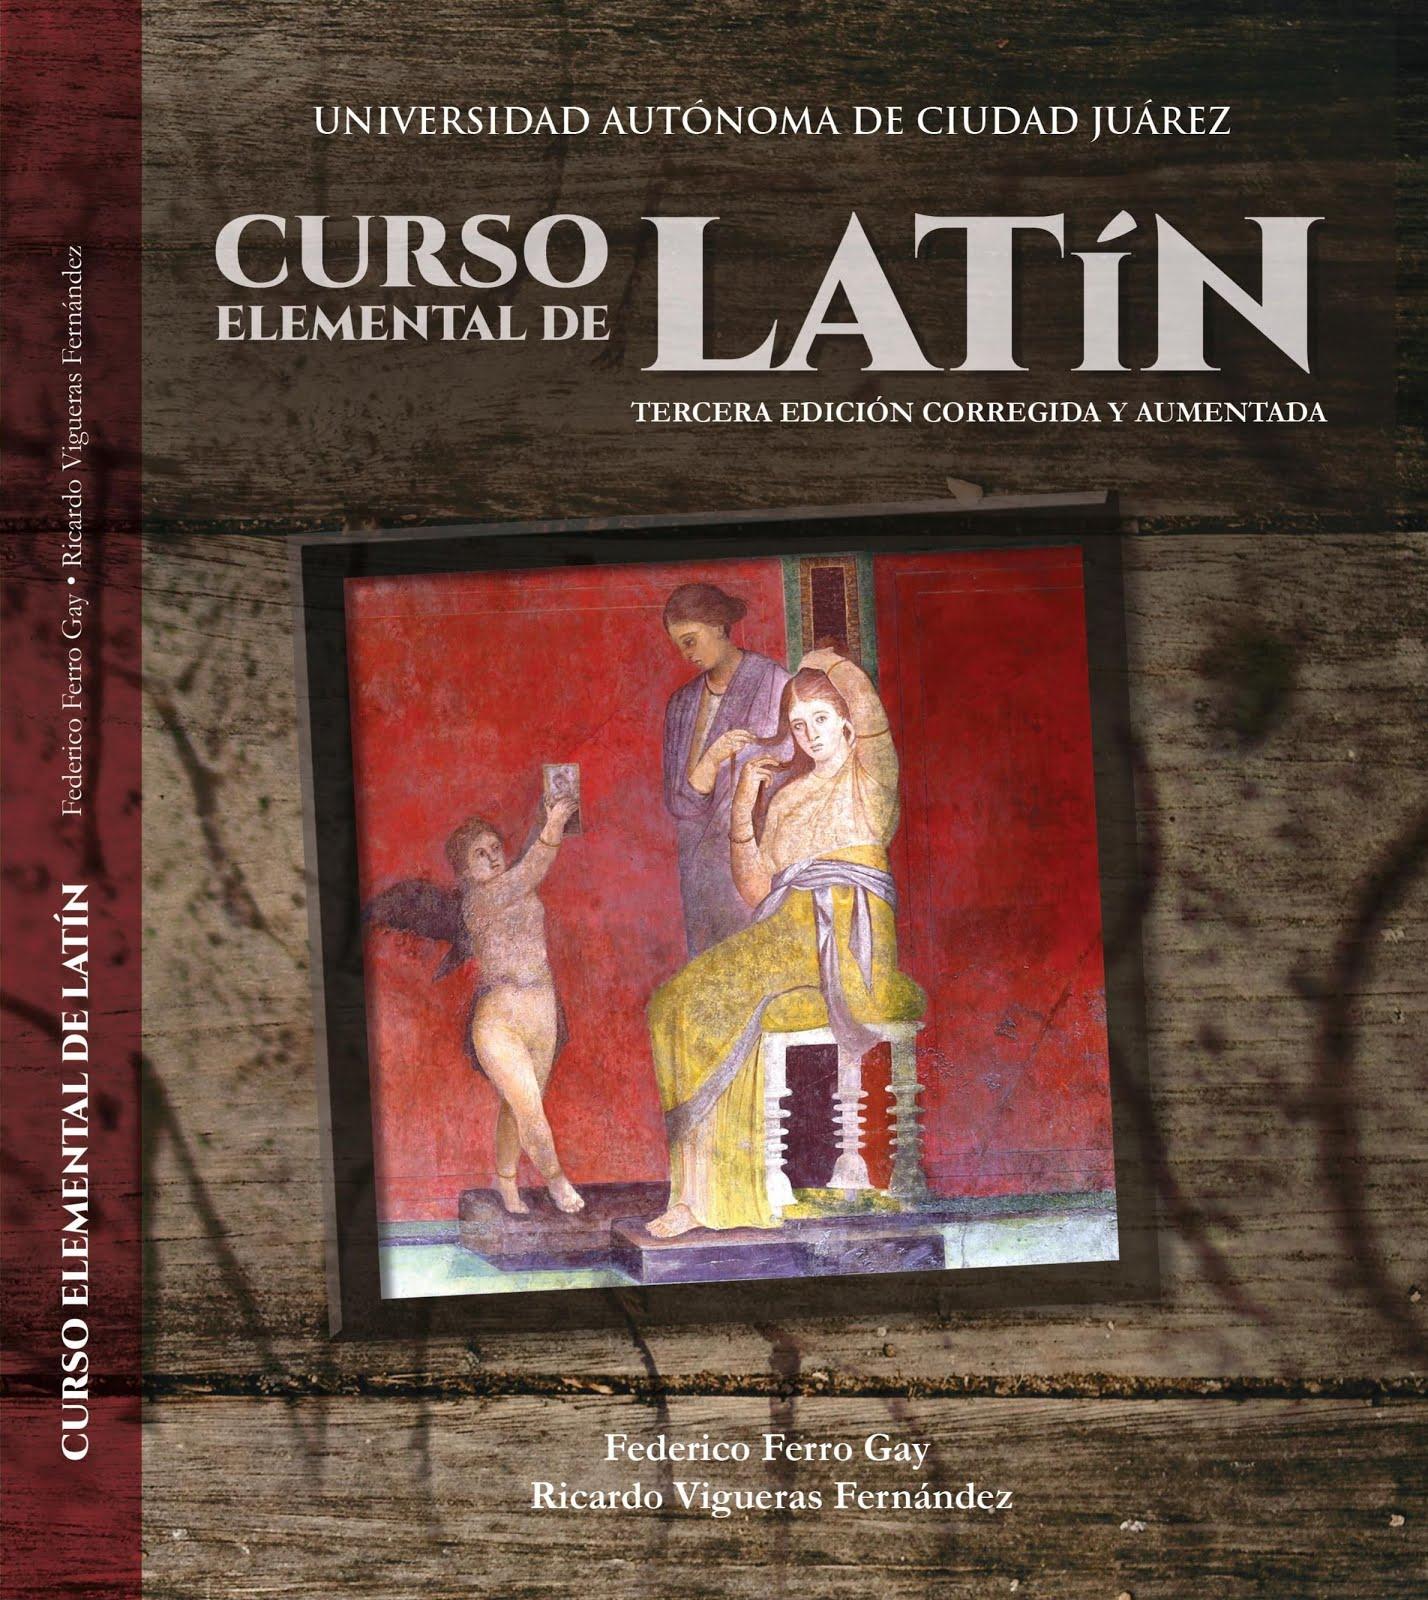 CURSO ELEMENTAL DE LATIN TERCERA EDICION